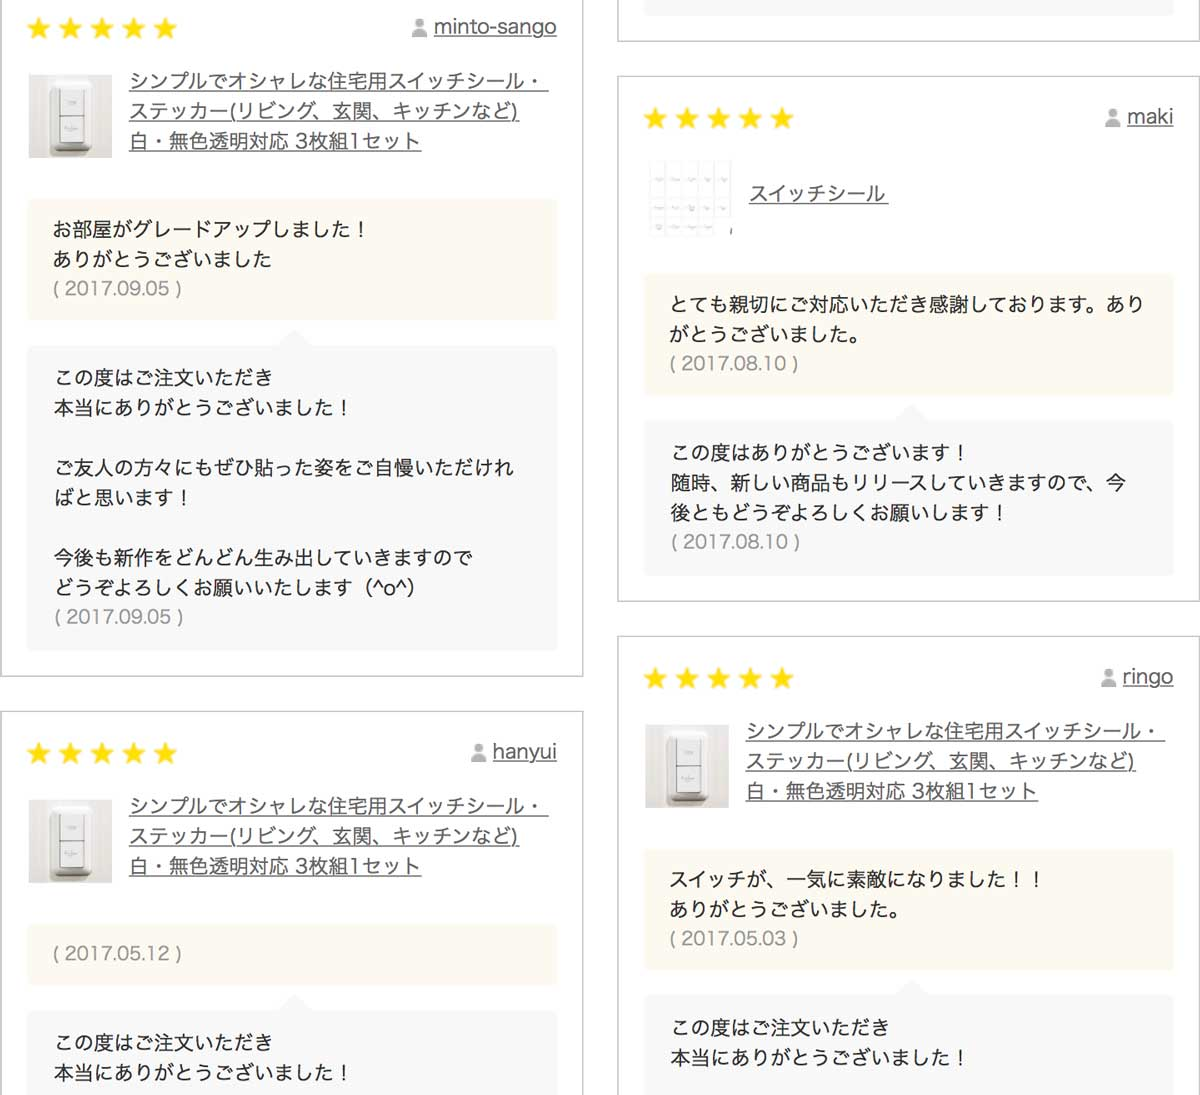 hitoiki ONLINESHOP(ひといきオンラインショップ)で実際に購入された方の評価や評判、レビュー、口コミ(クチコミ) review02